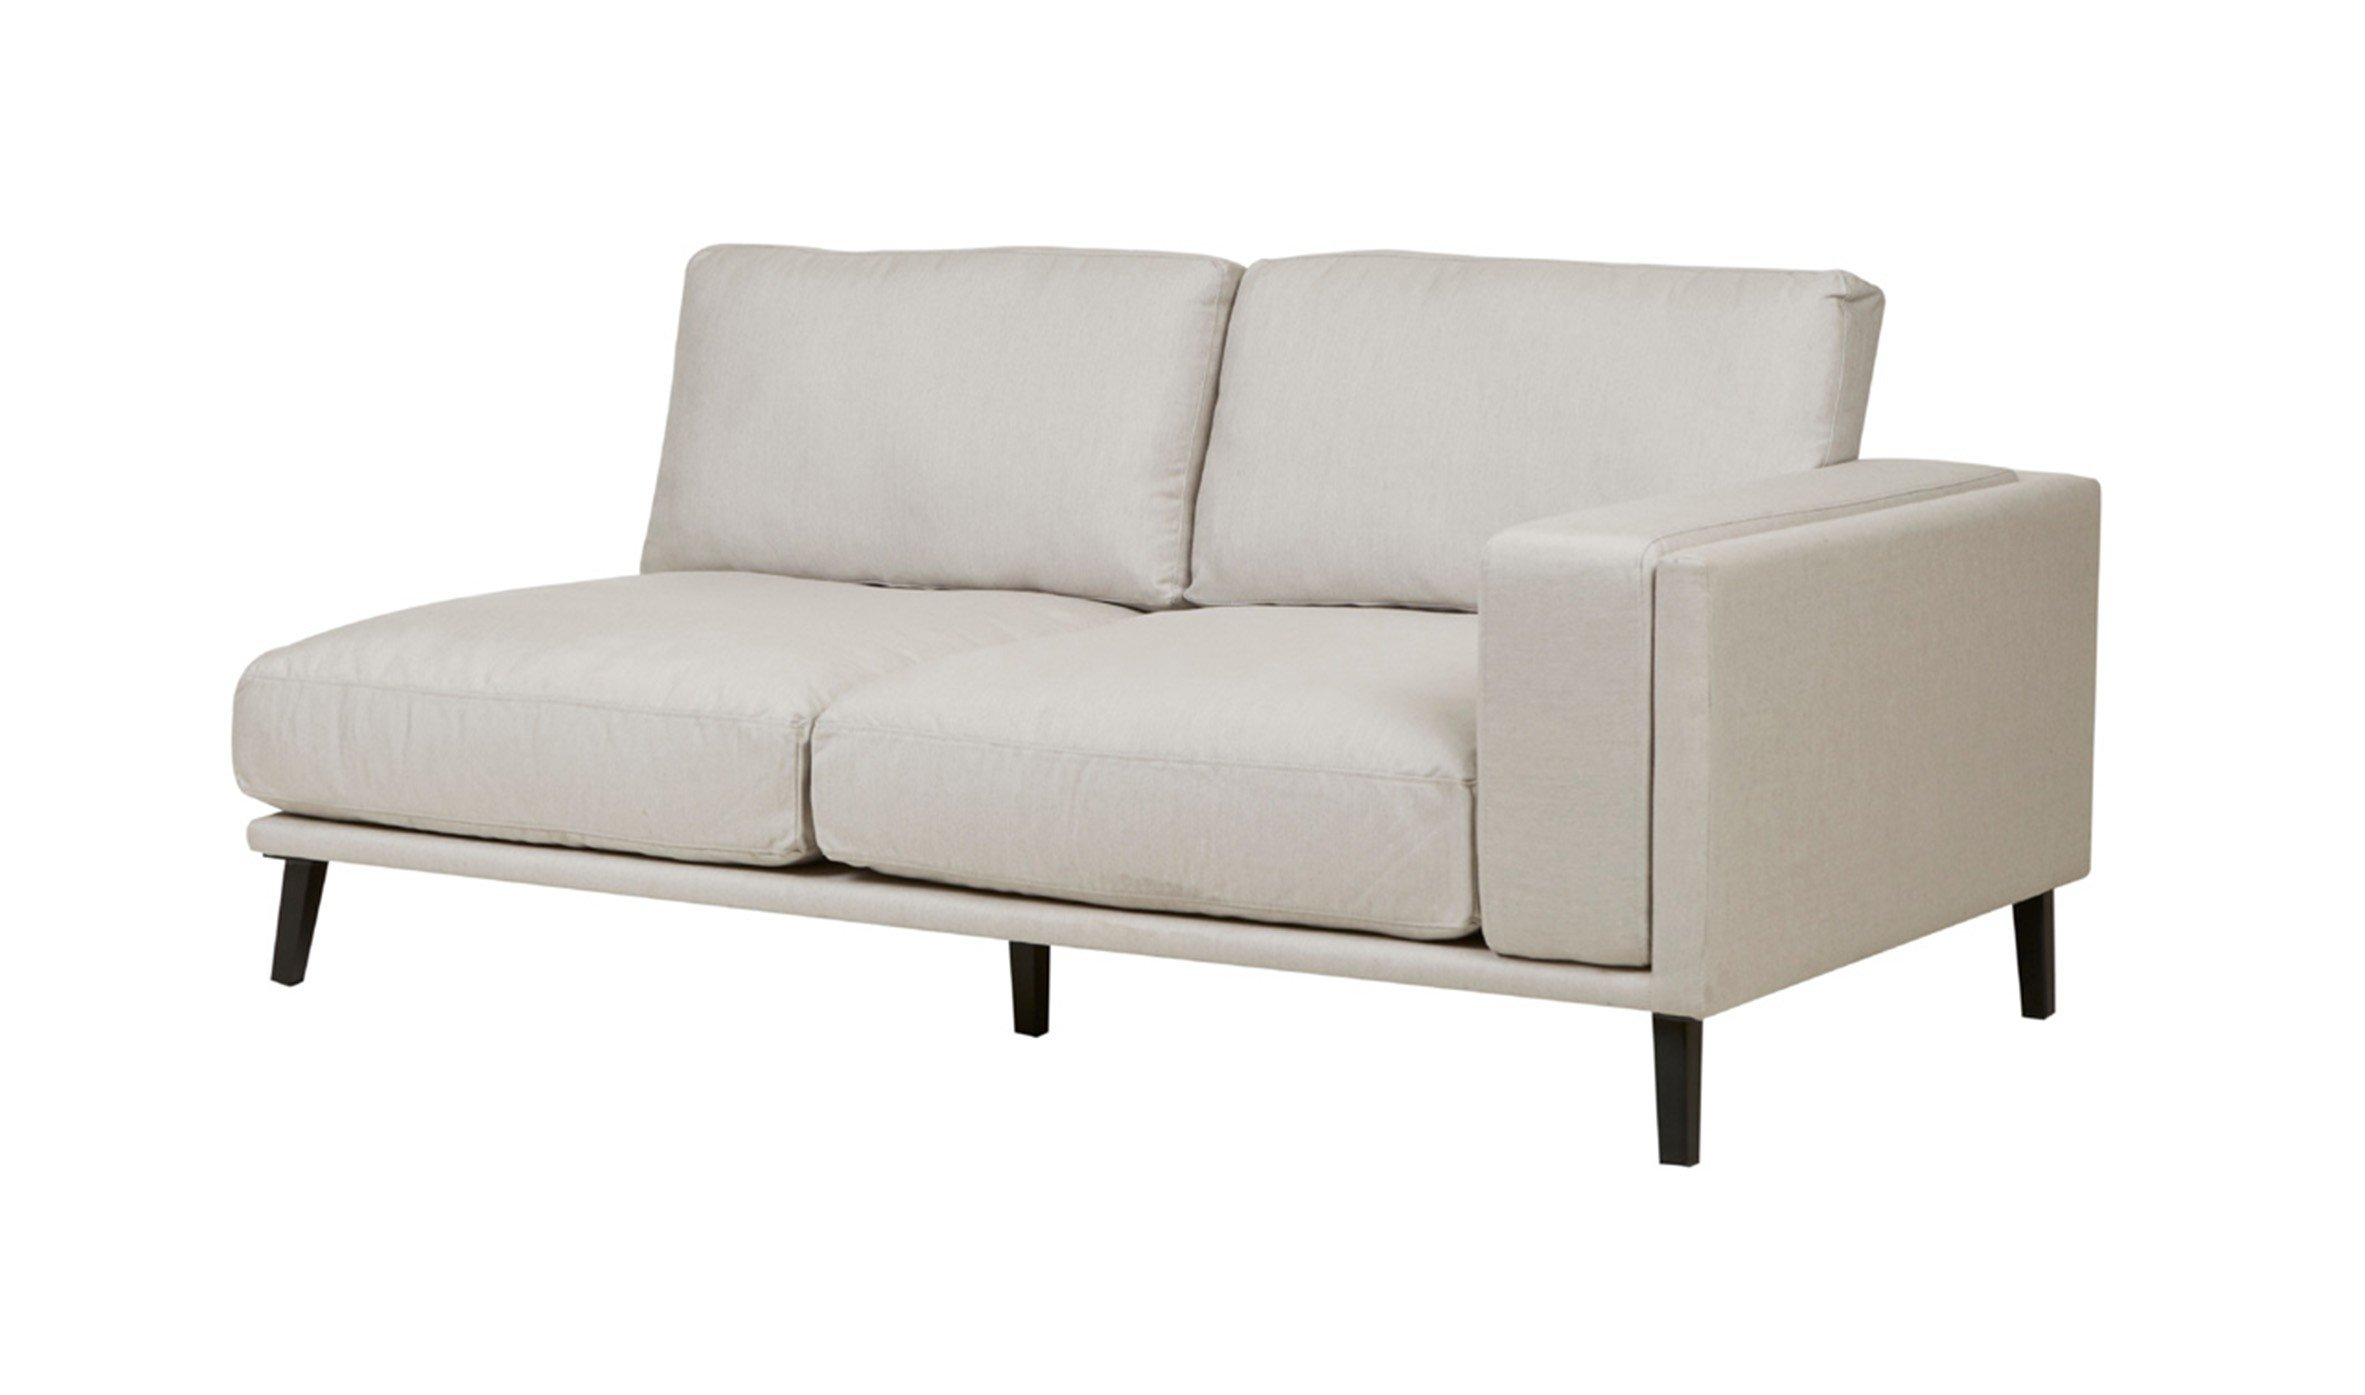 Furniture Thumbnails outdoor-sofas-aruba-square-2-right